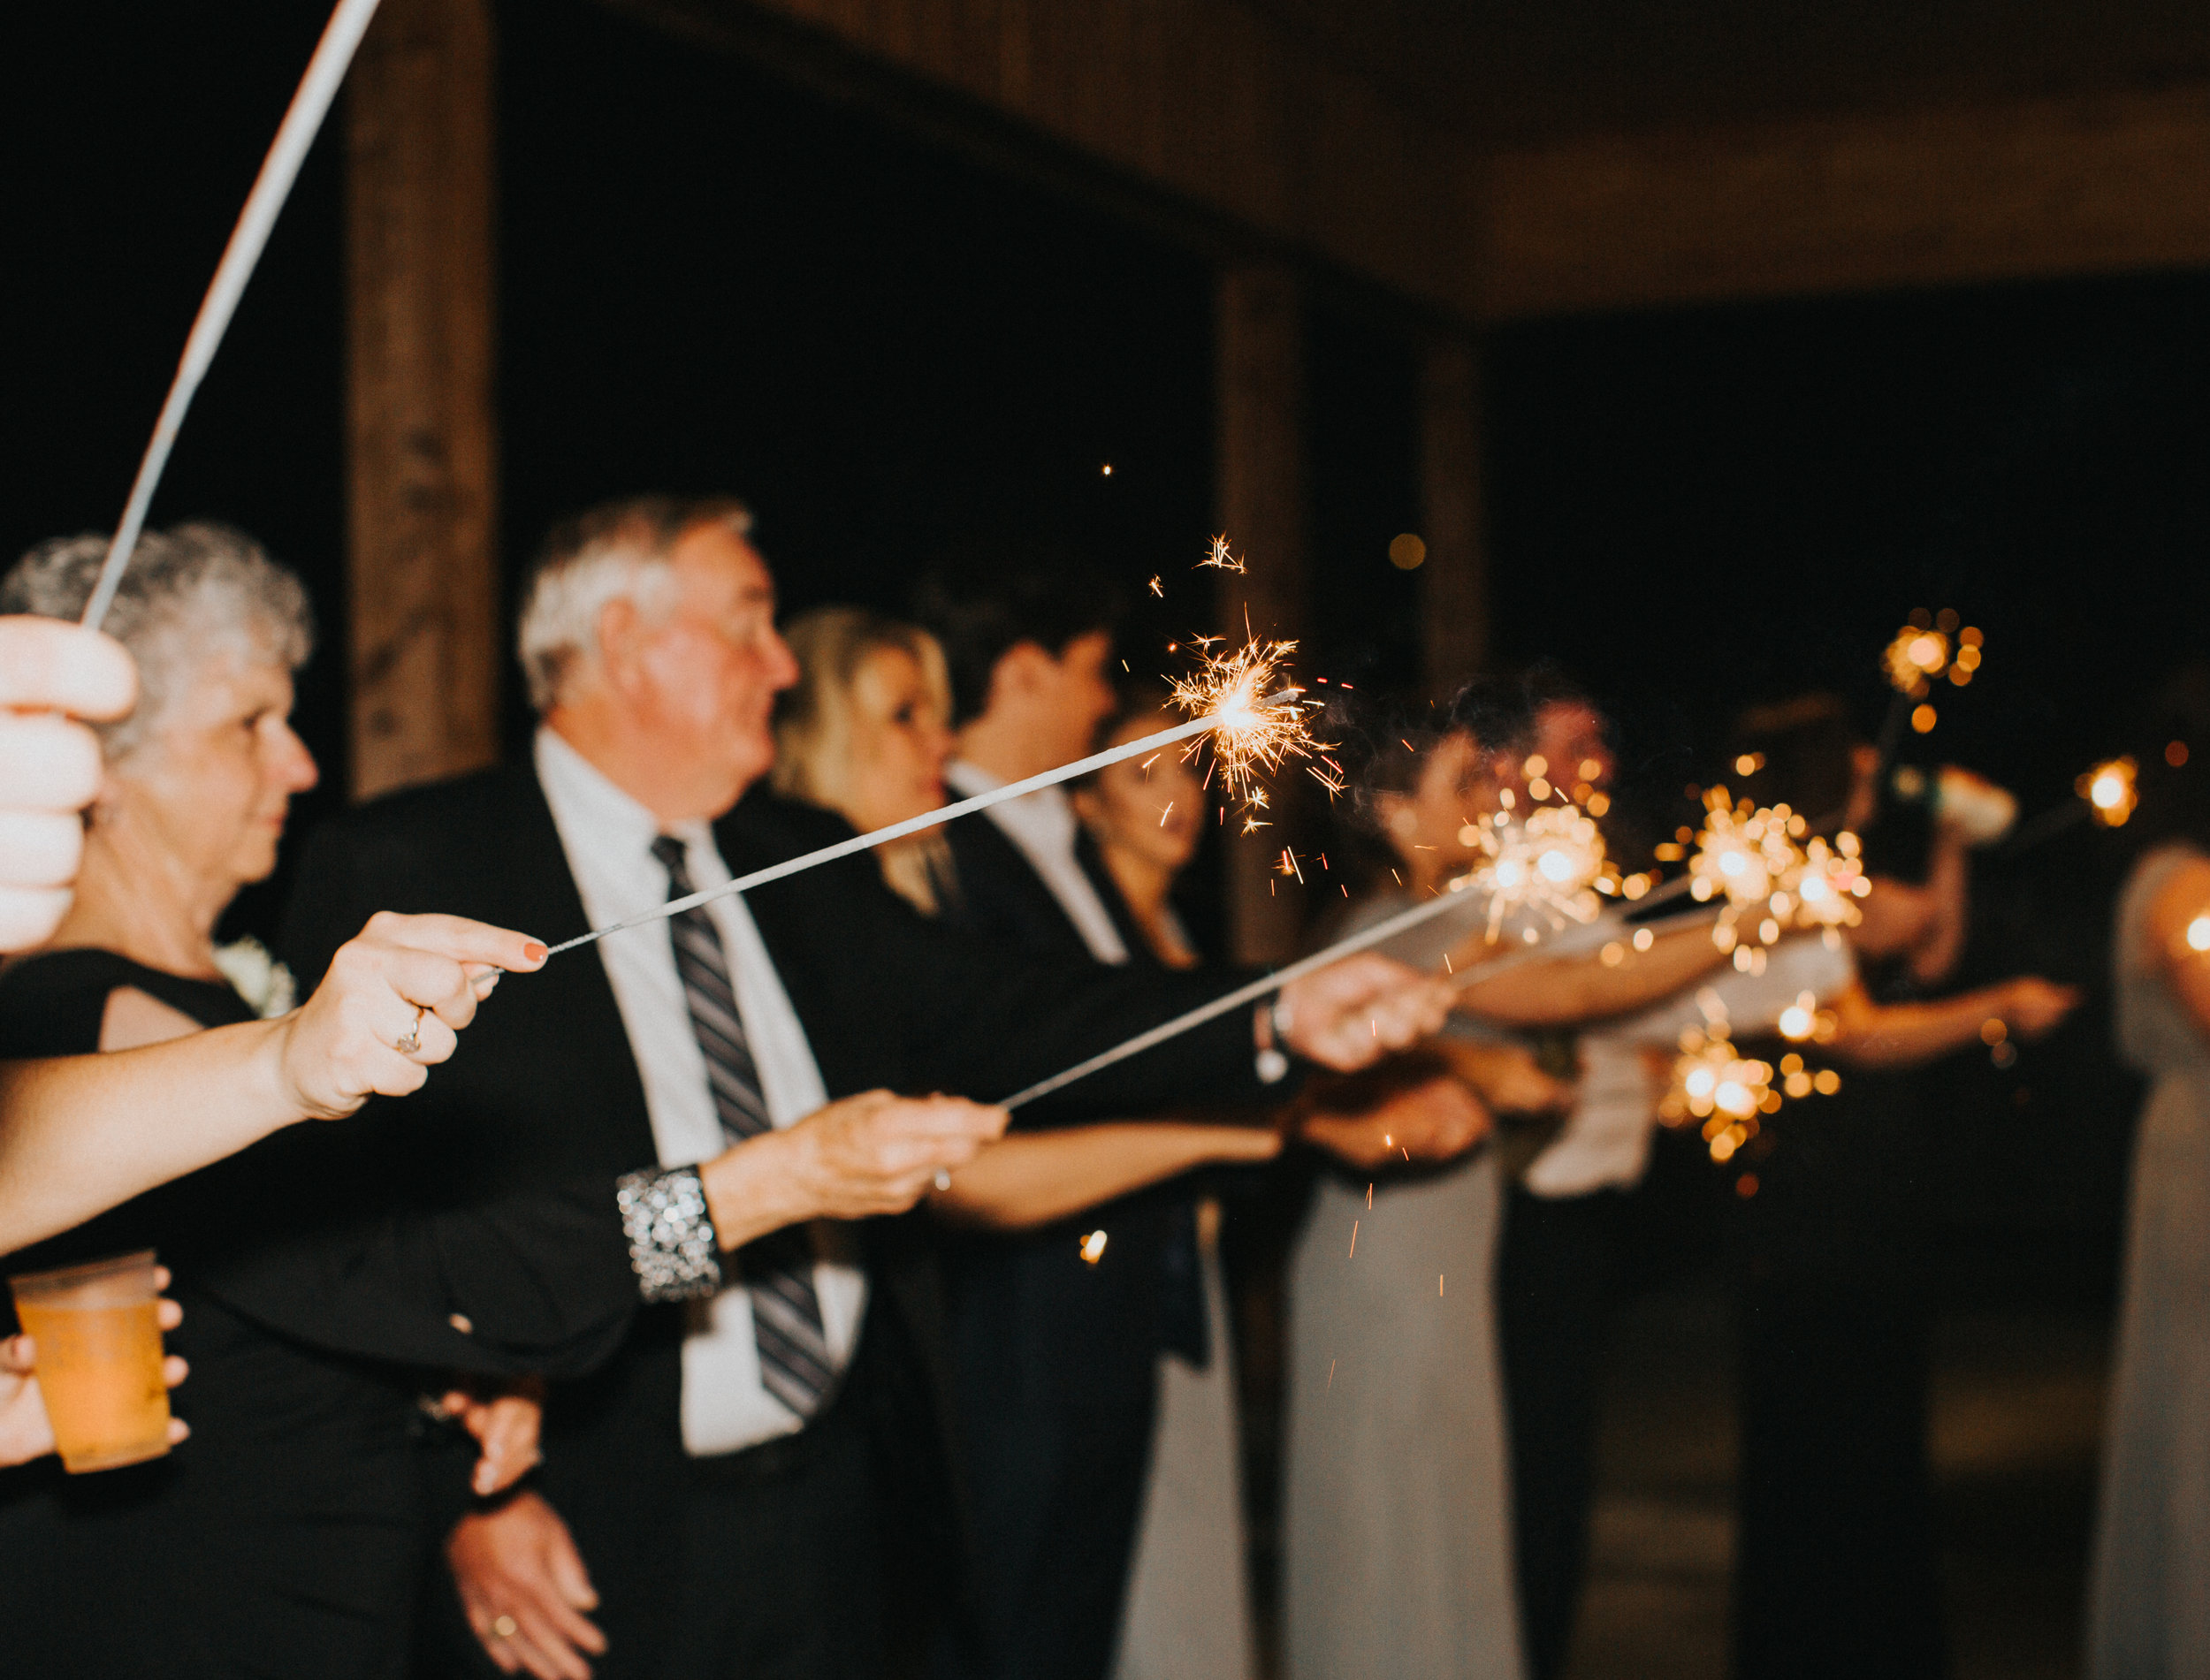 WeddingtonWedding1426.jpg